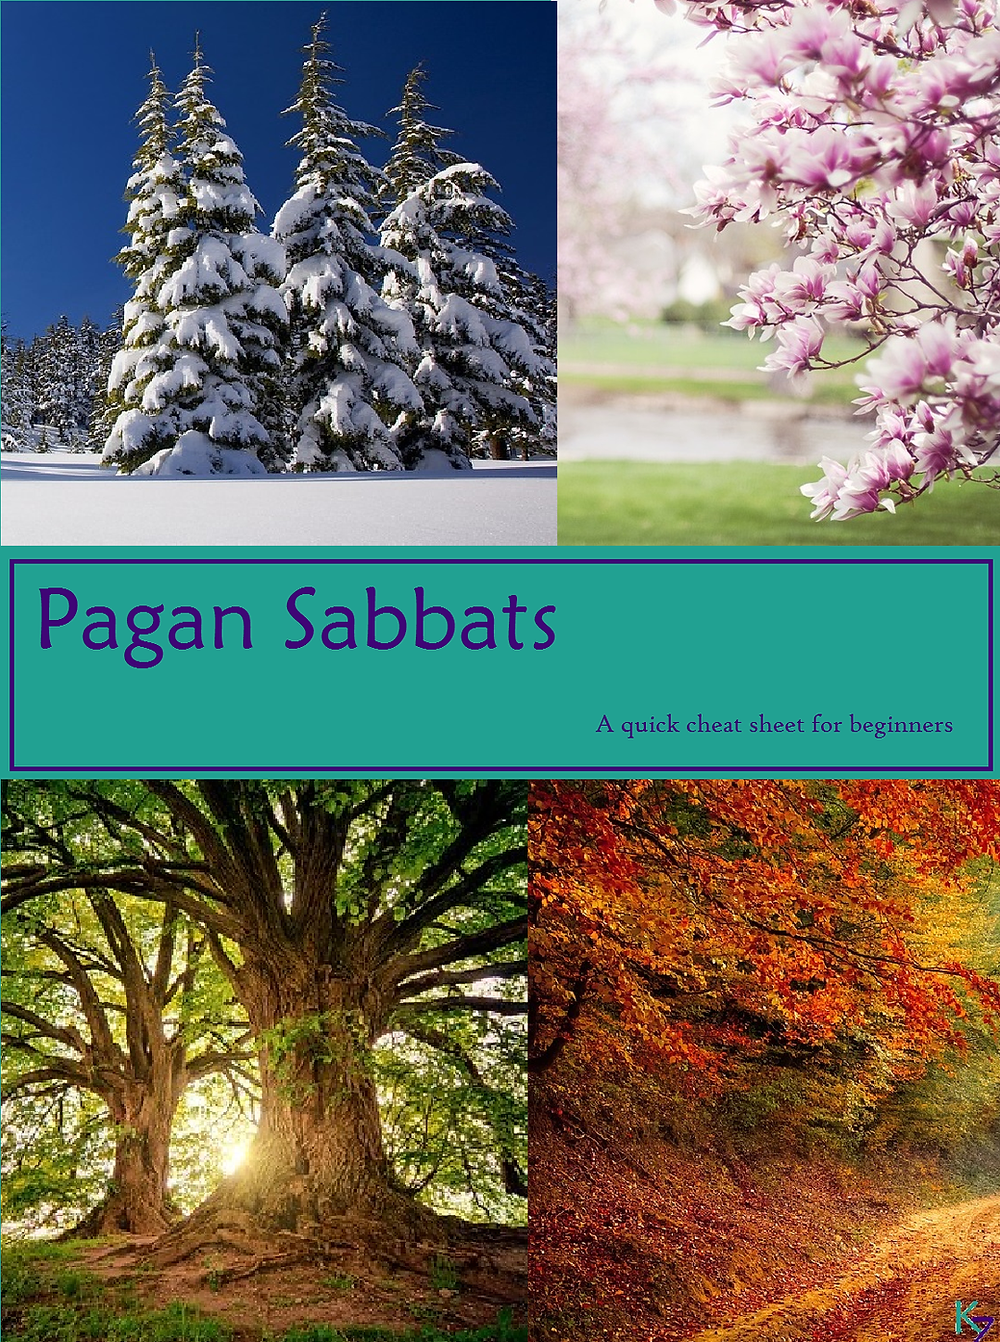 wiccan pagan holiday, sabbat, celebrations, cheat sheet, wheel of the year,